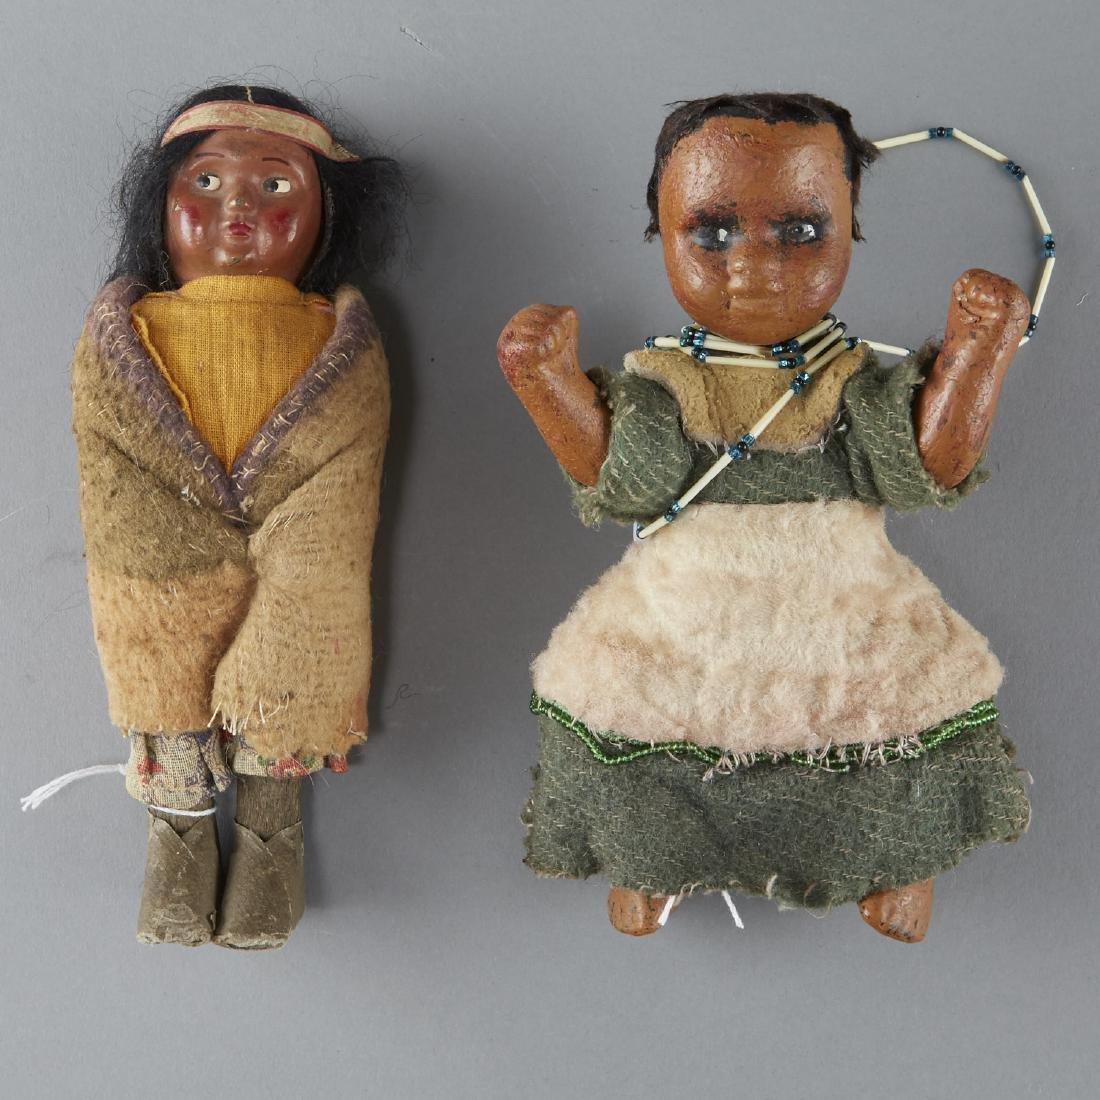 2 Native American Dolls, 1 Skookum